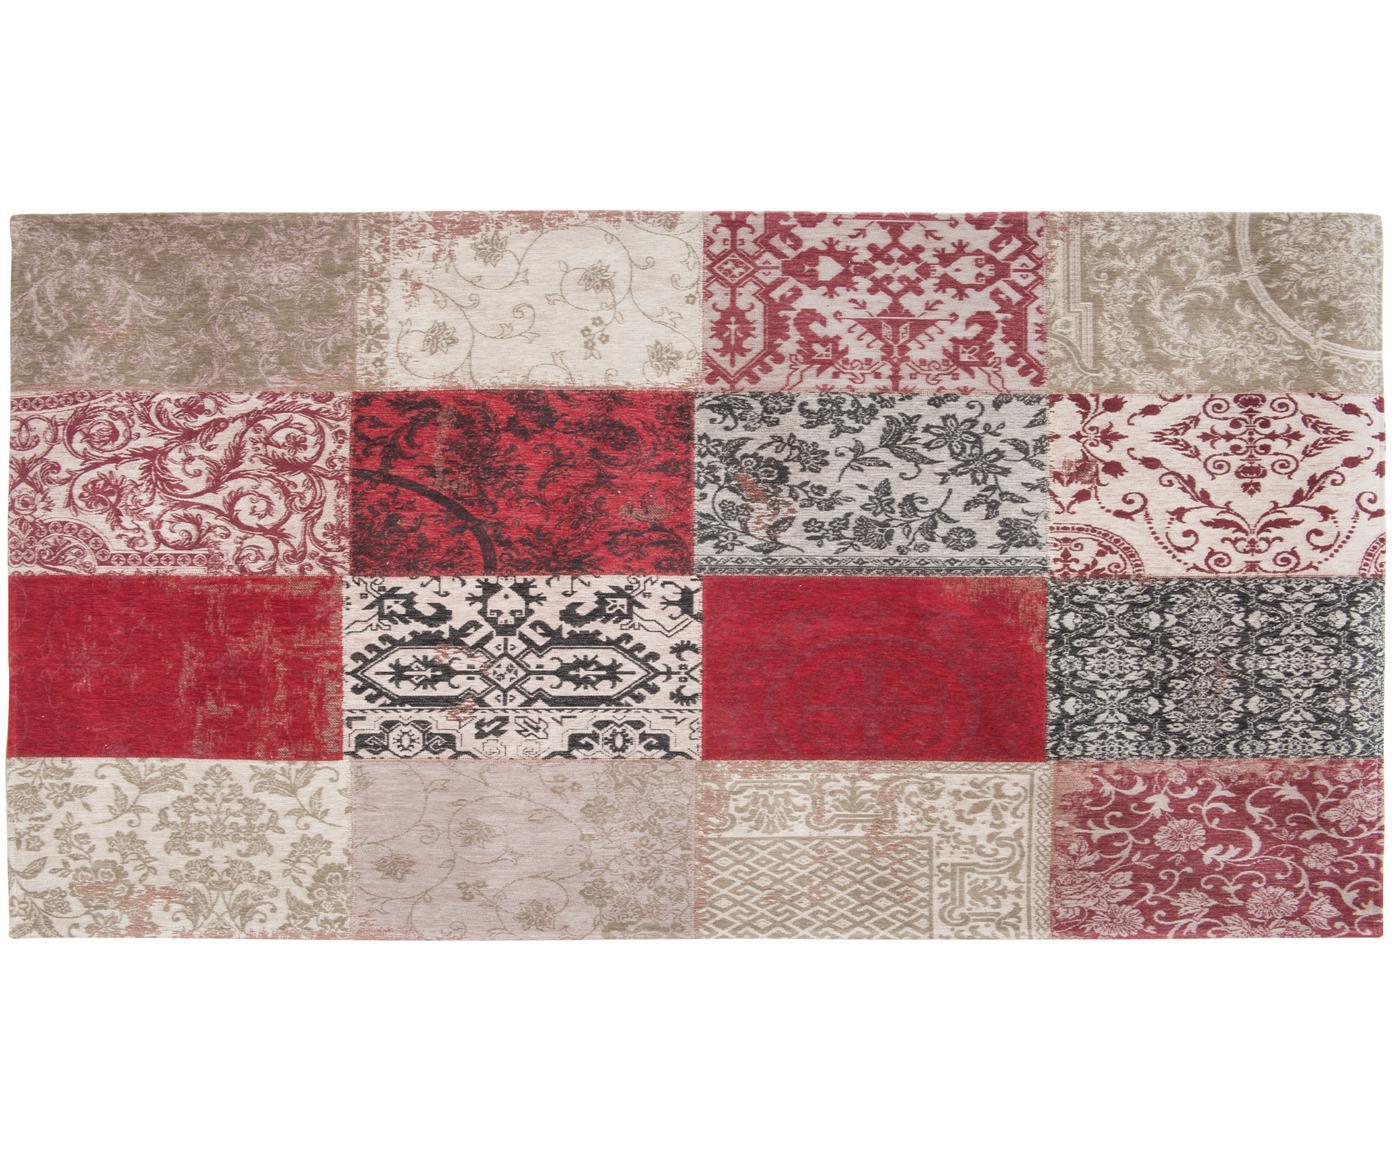 Alfombra de cheinilla de diseño Multi, Parte superior: 85%chenilla (algodón), 1, Reverso: mezcla de algodón, recubi, Rojo, beige, negro, An 80 x L 150 cm (Tamaño XS)